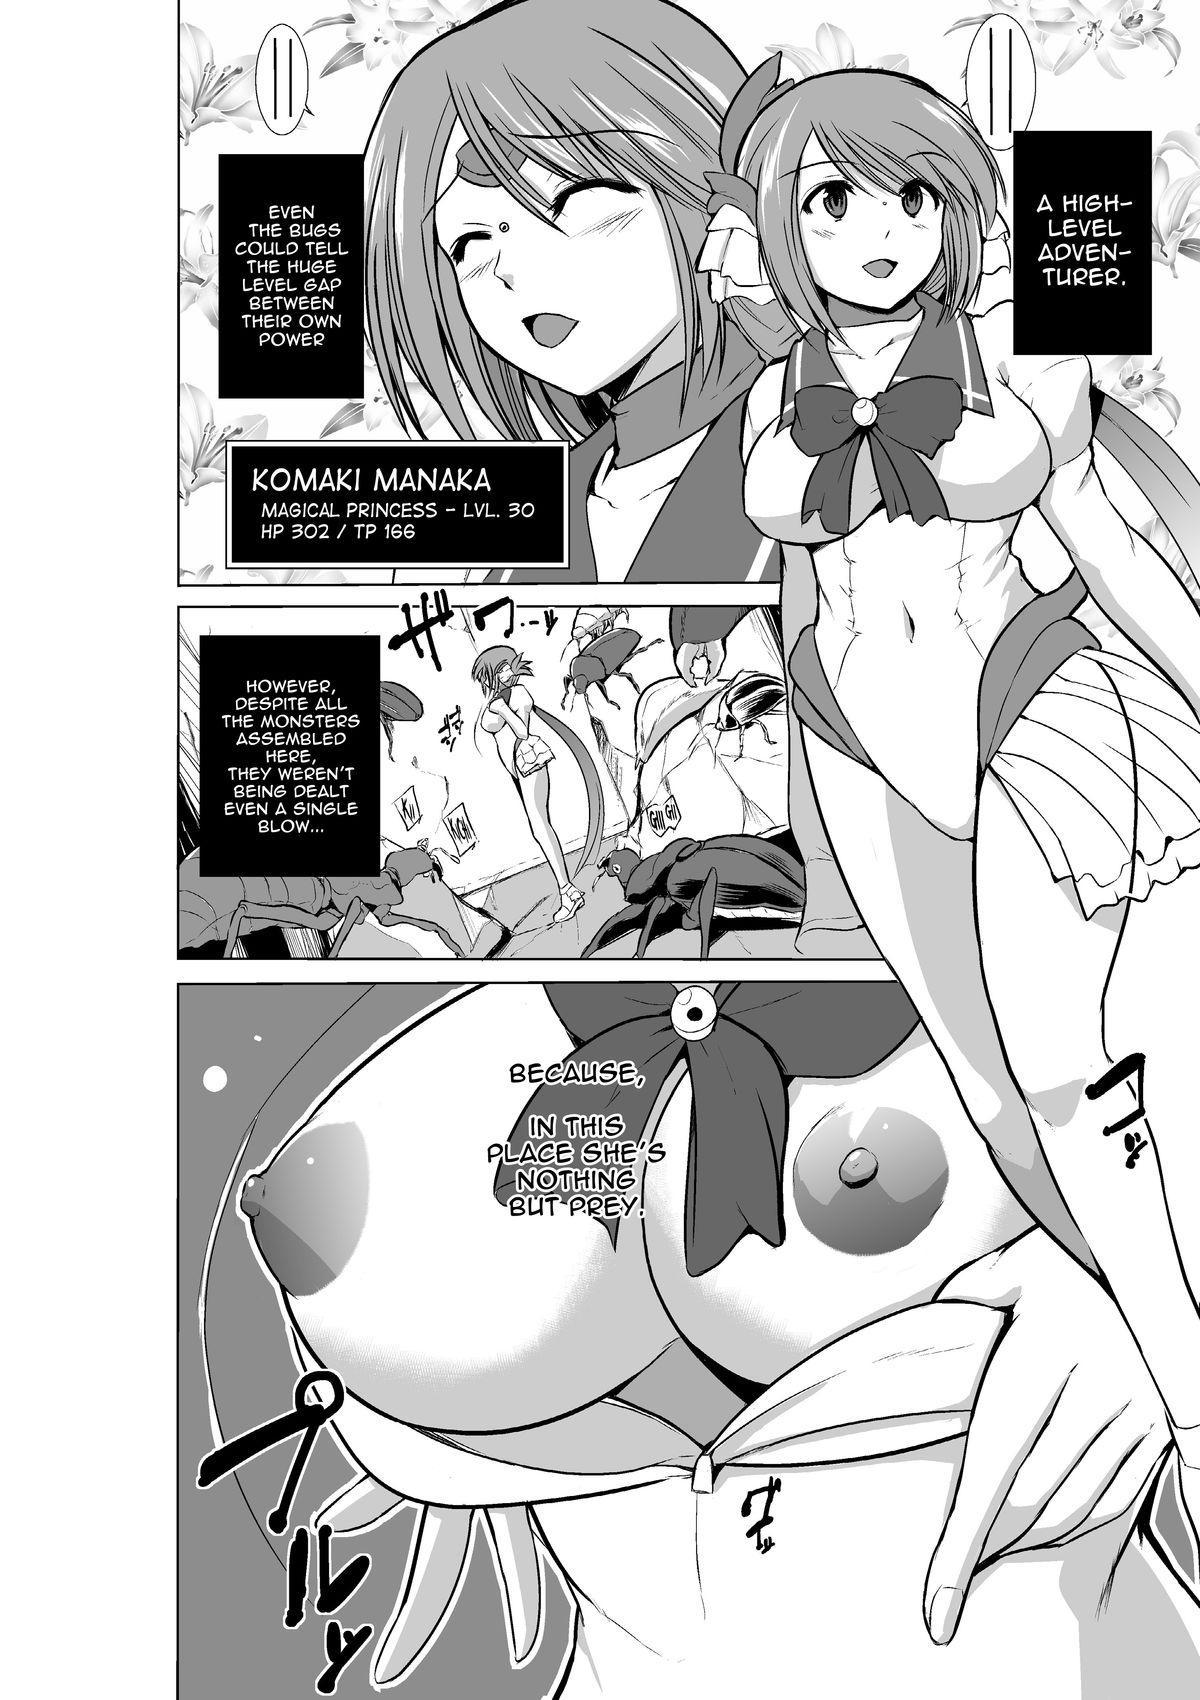 [Tiba-Santi] Dungeon Travelers - Manaka no Himegoto 2 | Dungeon Travelers - Manaka's Secret 2 (ToHeart2 Dungeon Travelers) [English] {Mant} [Digital] 3